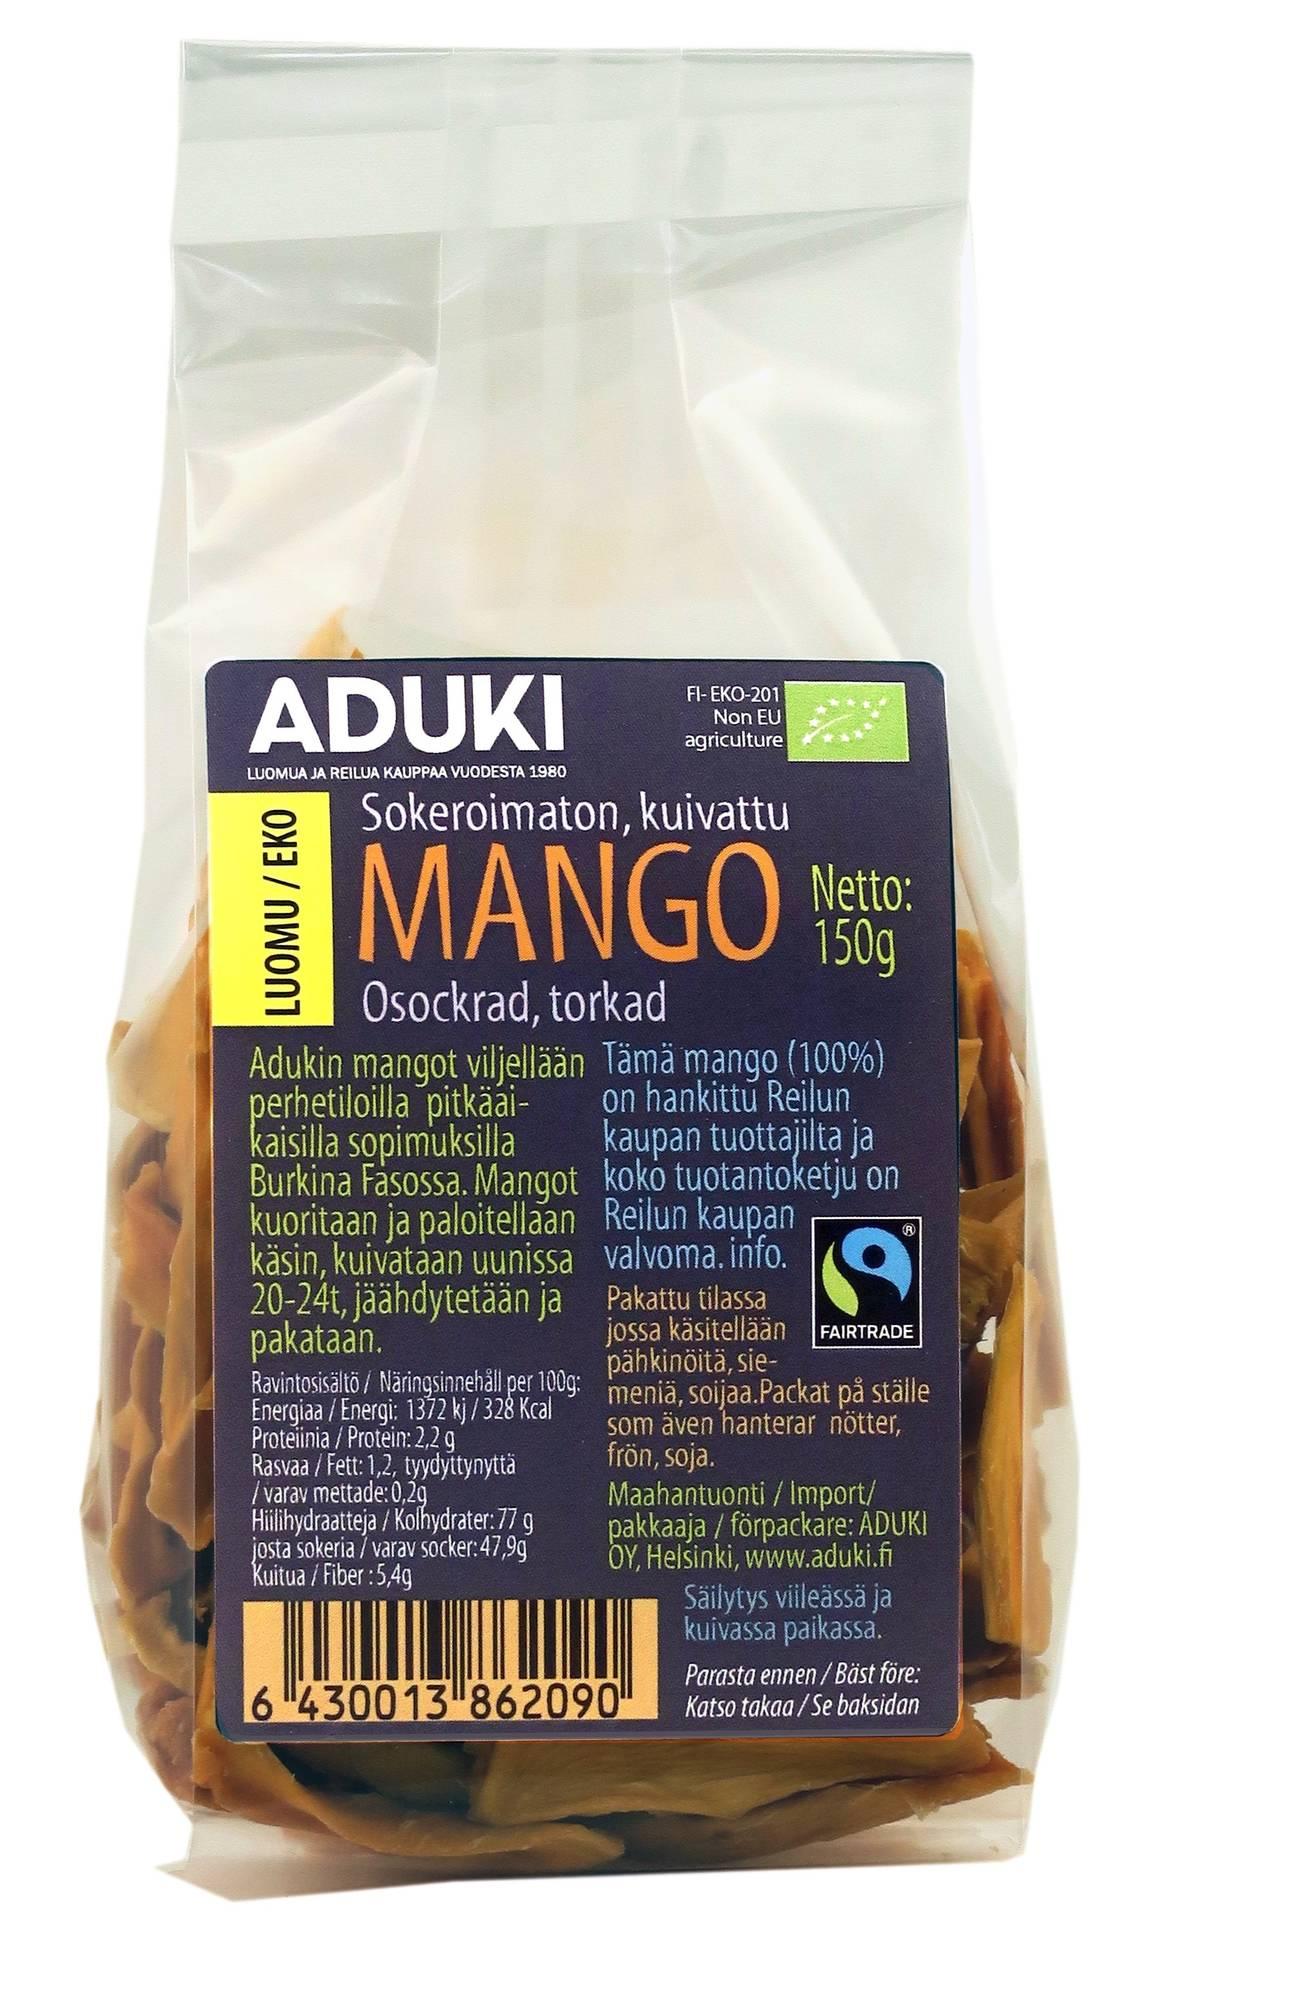 Aduki sokeroimaton mango